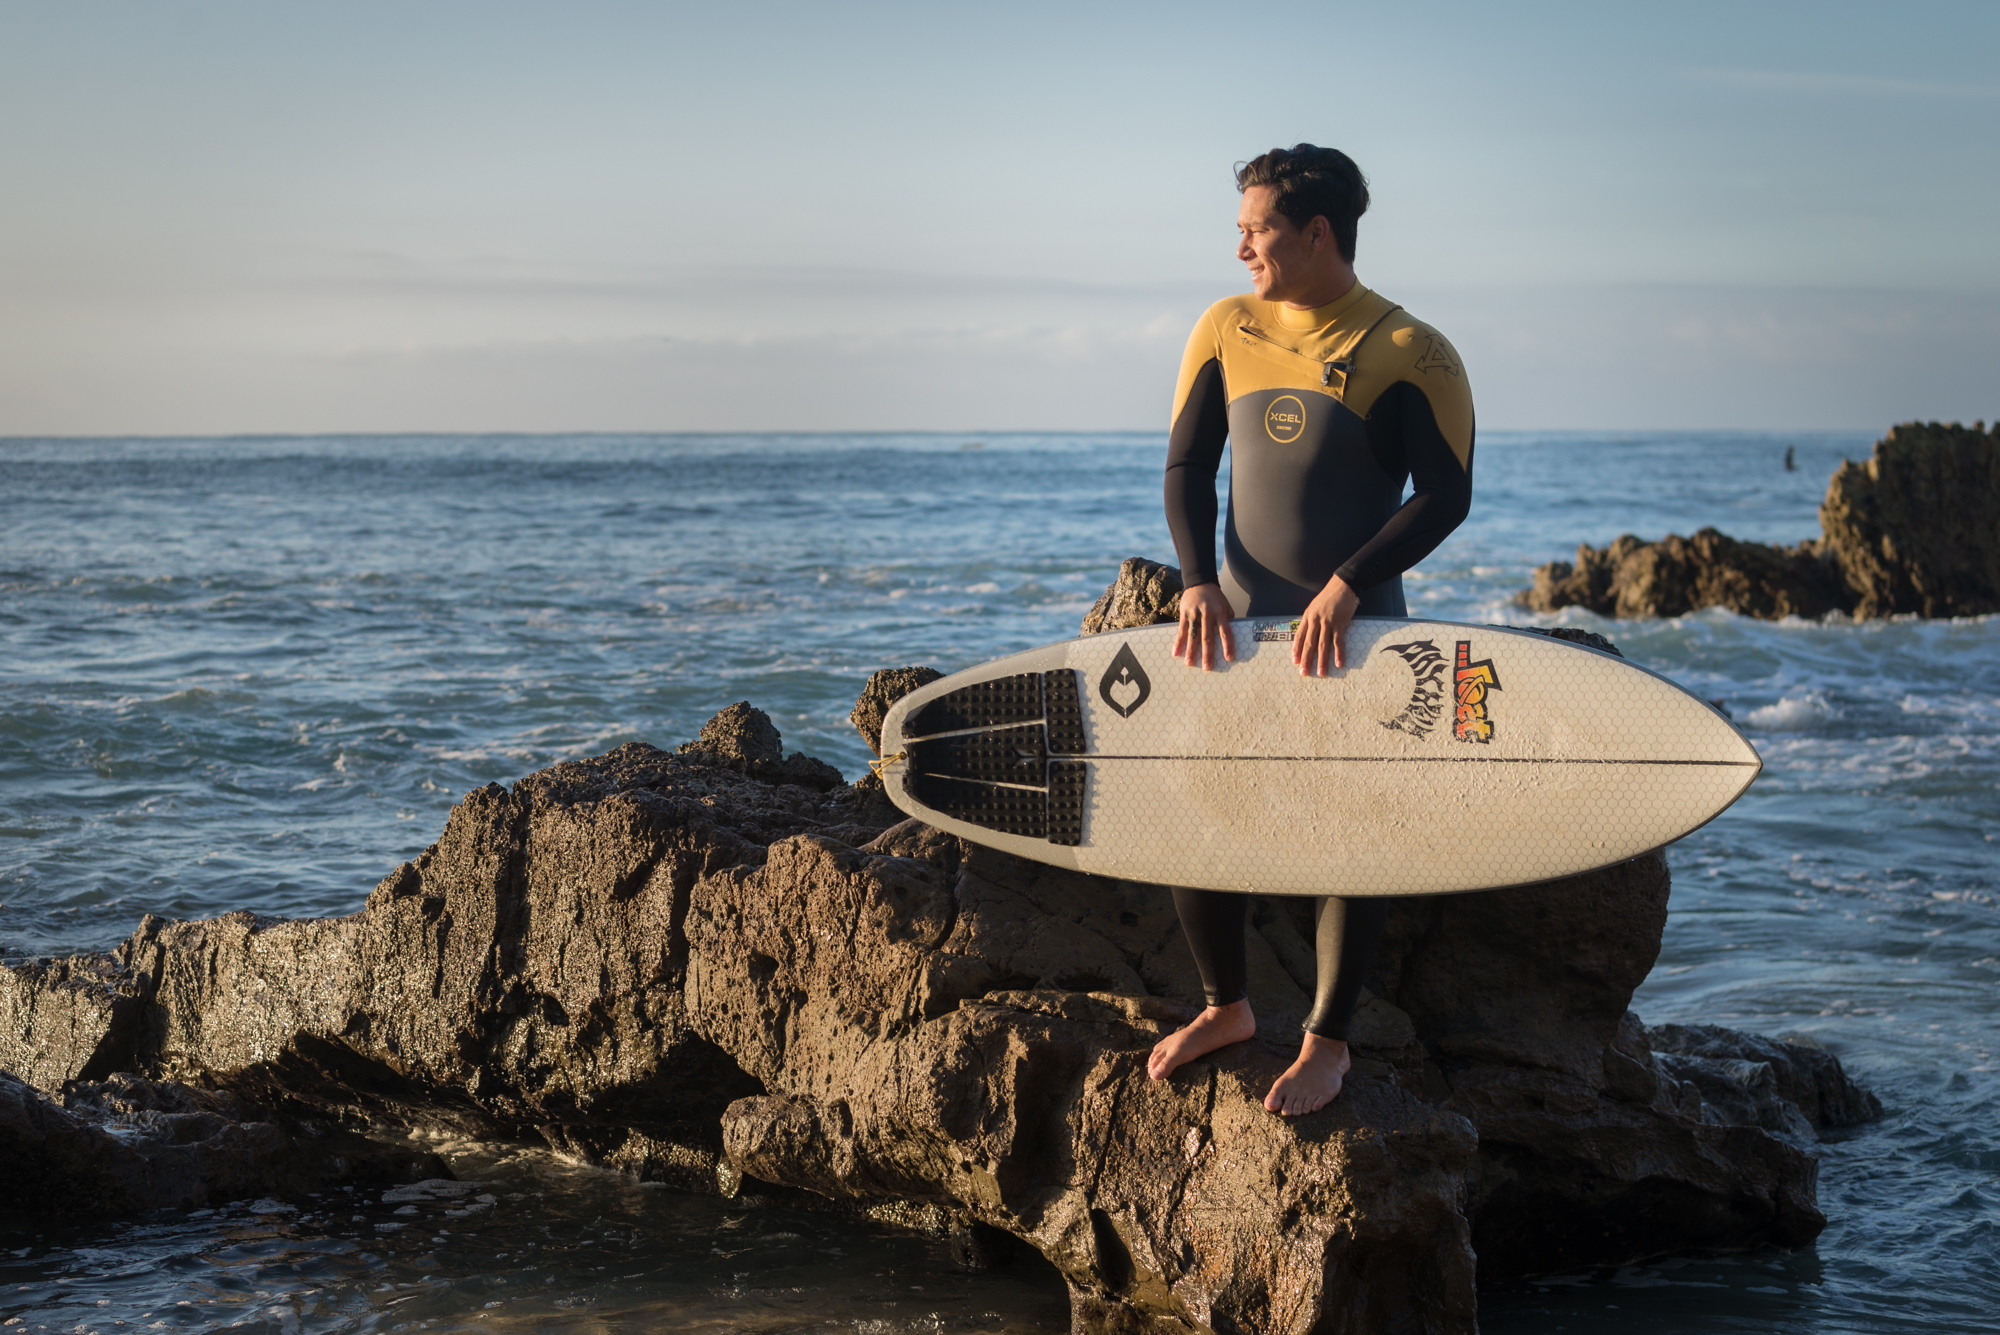 Surfer-Environmental-Portrait_Active-Lifestyle-Photography013.JPG